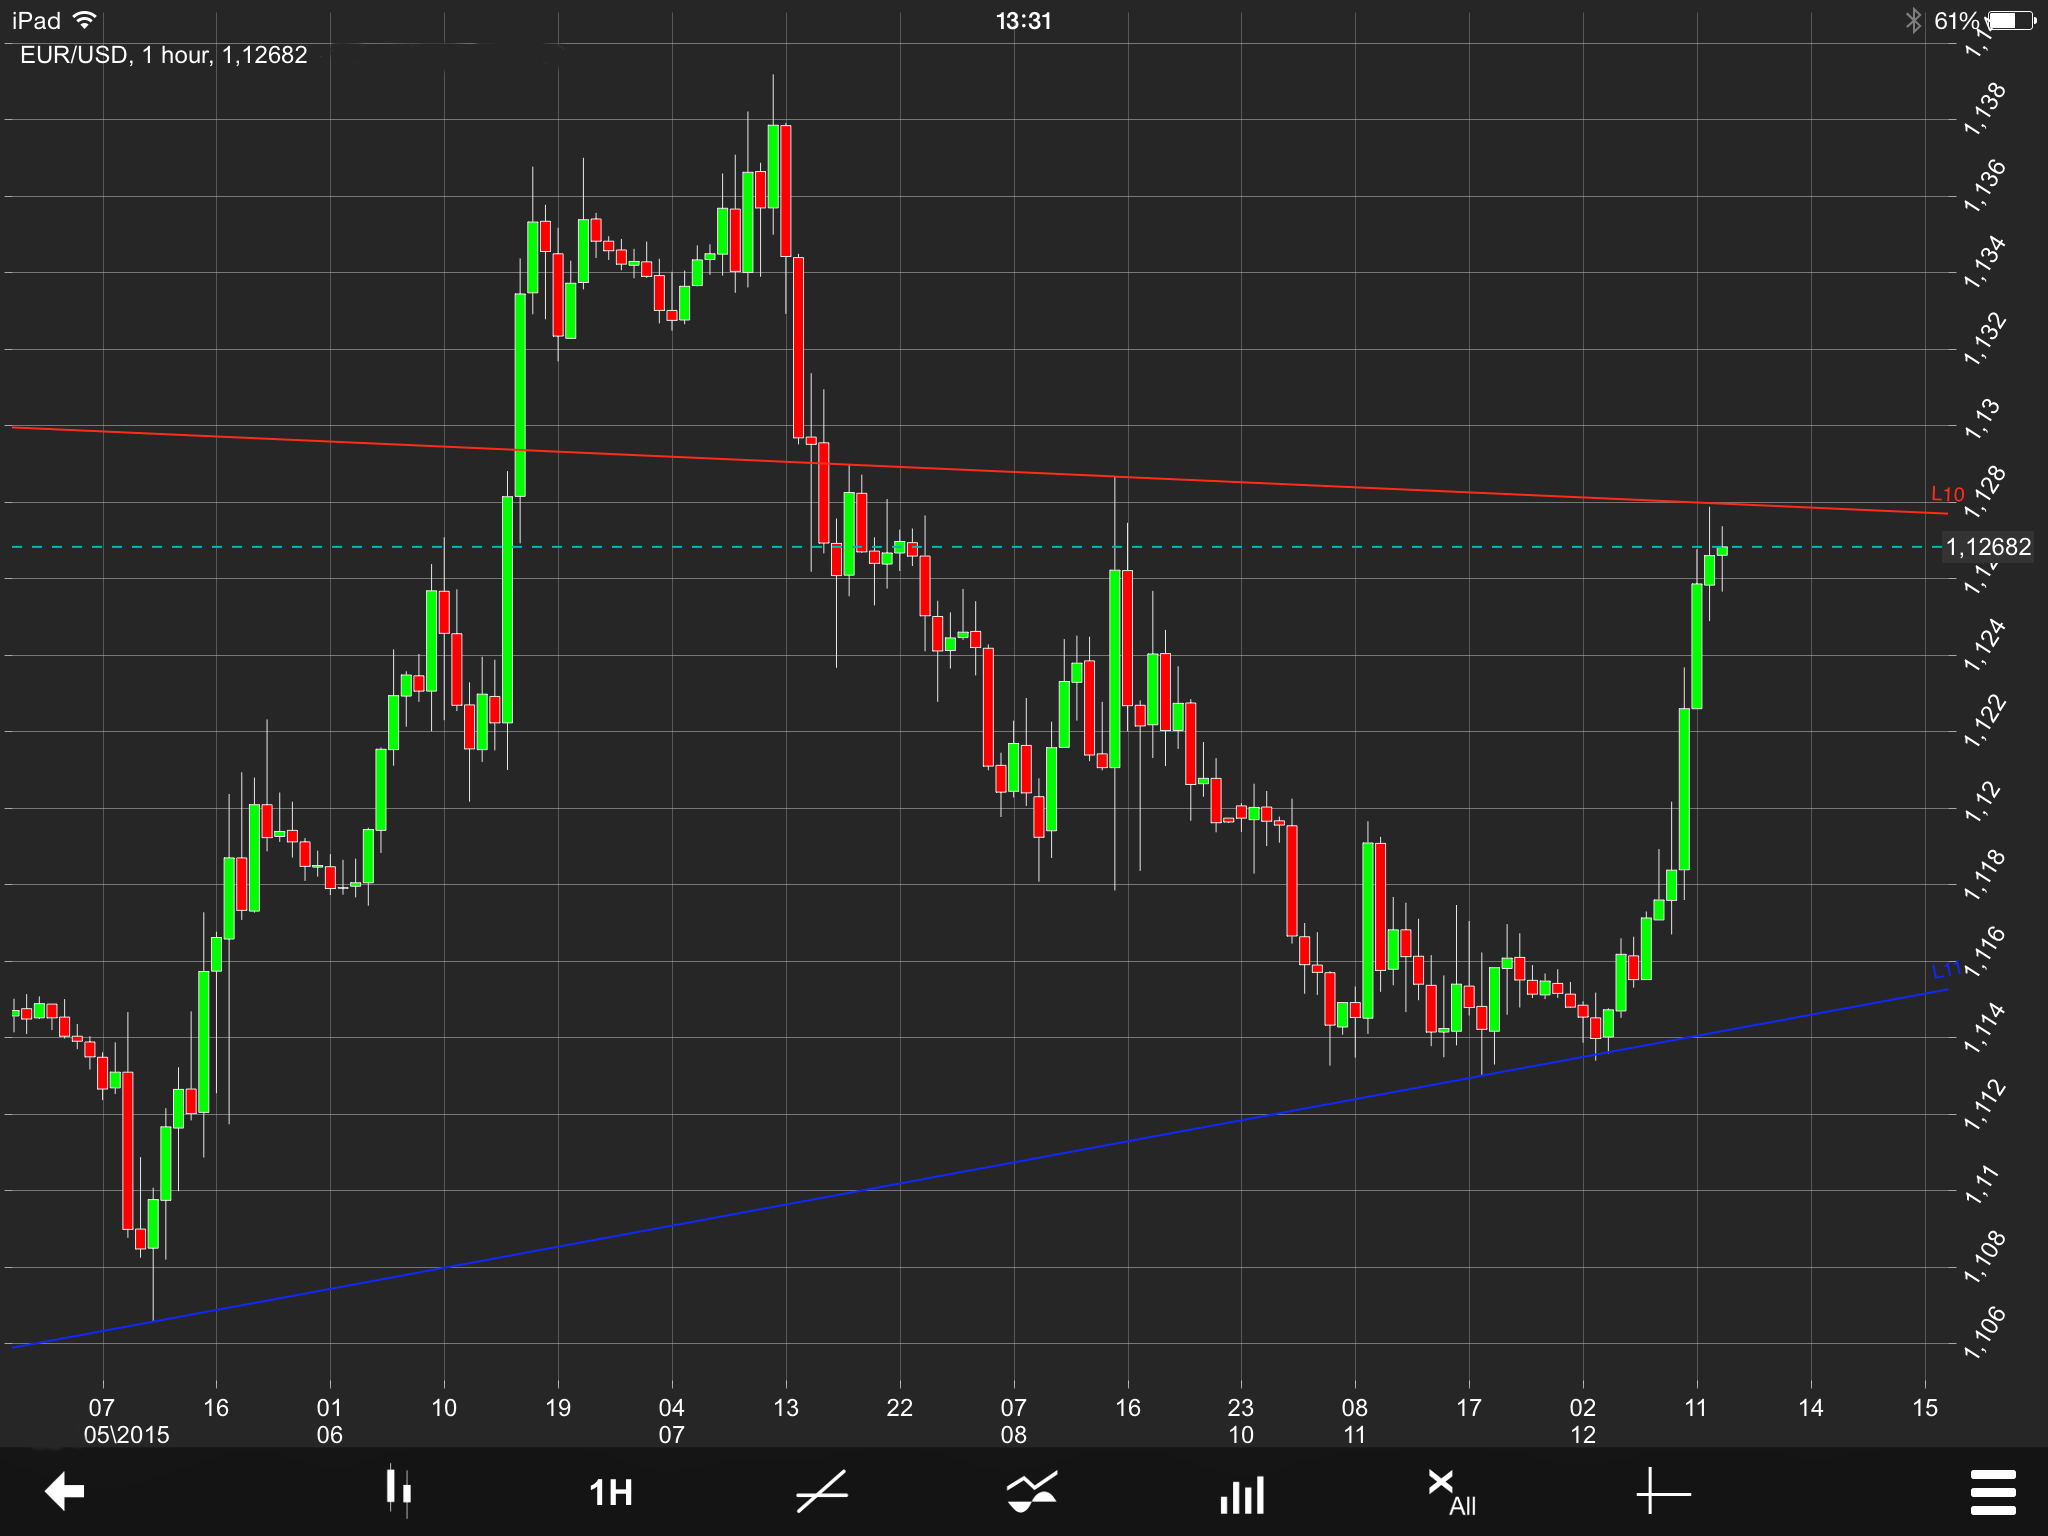 EUR/USD Chart 12/05/2015